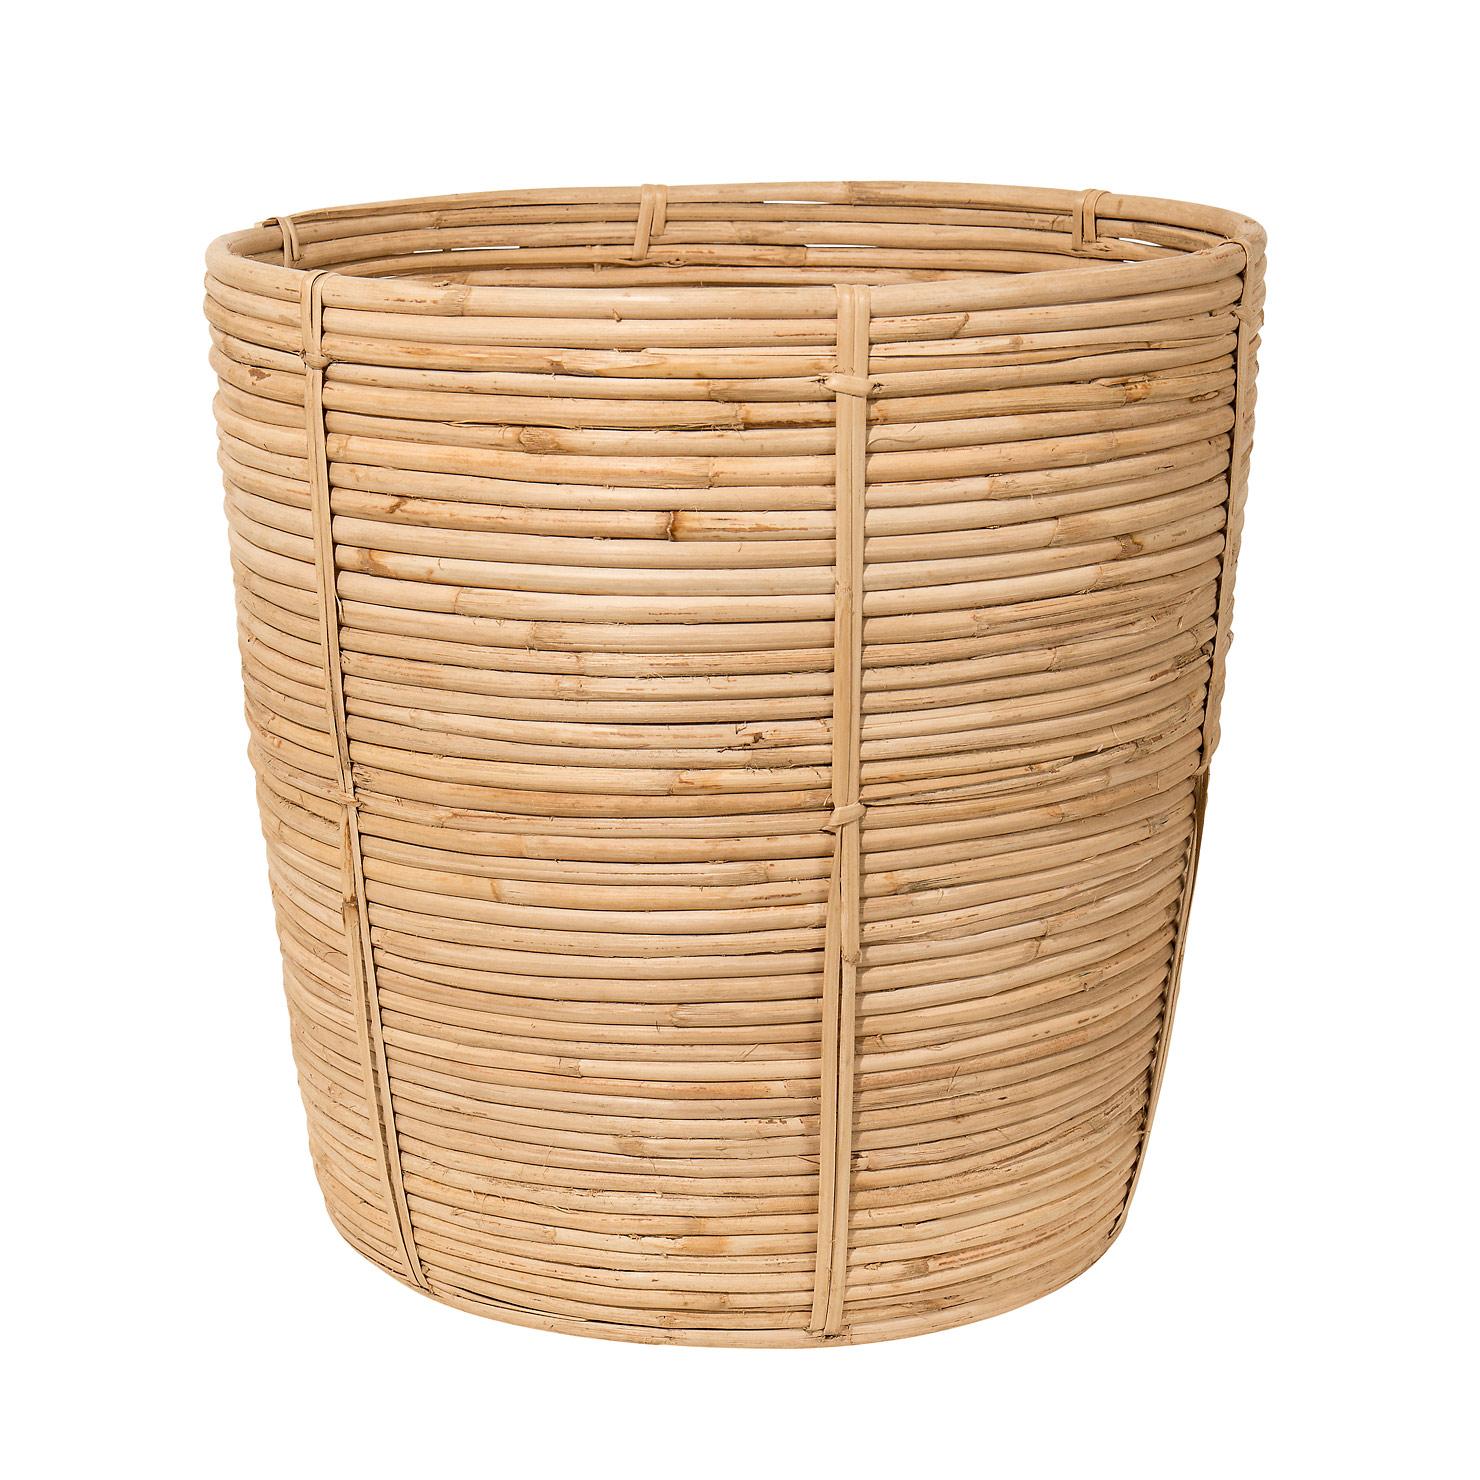 Cane Wastebasket 36x37cm, Rattan